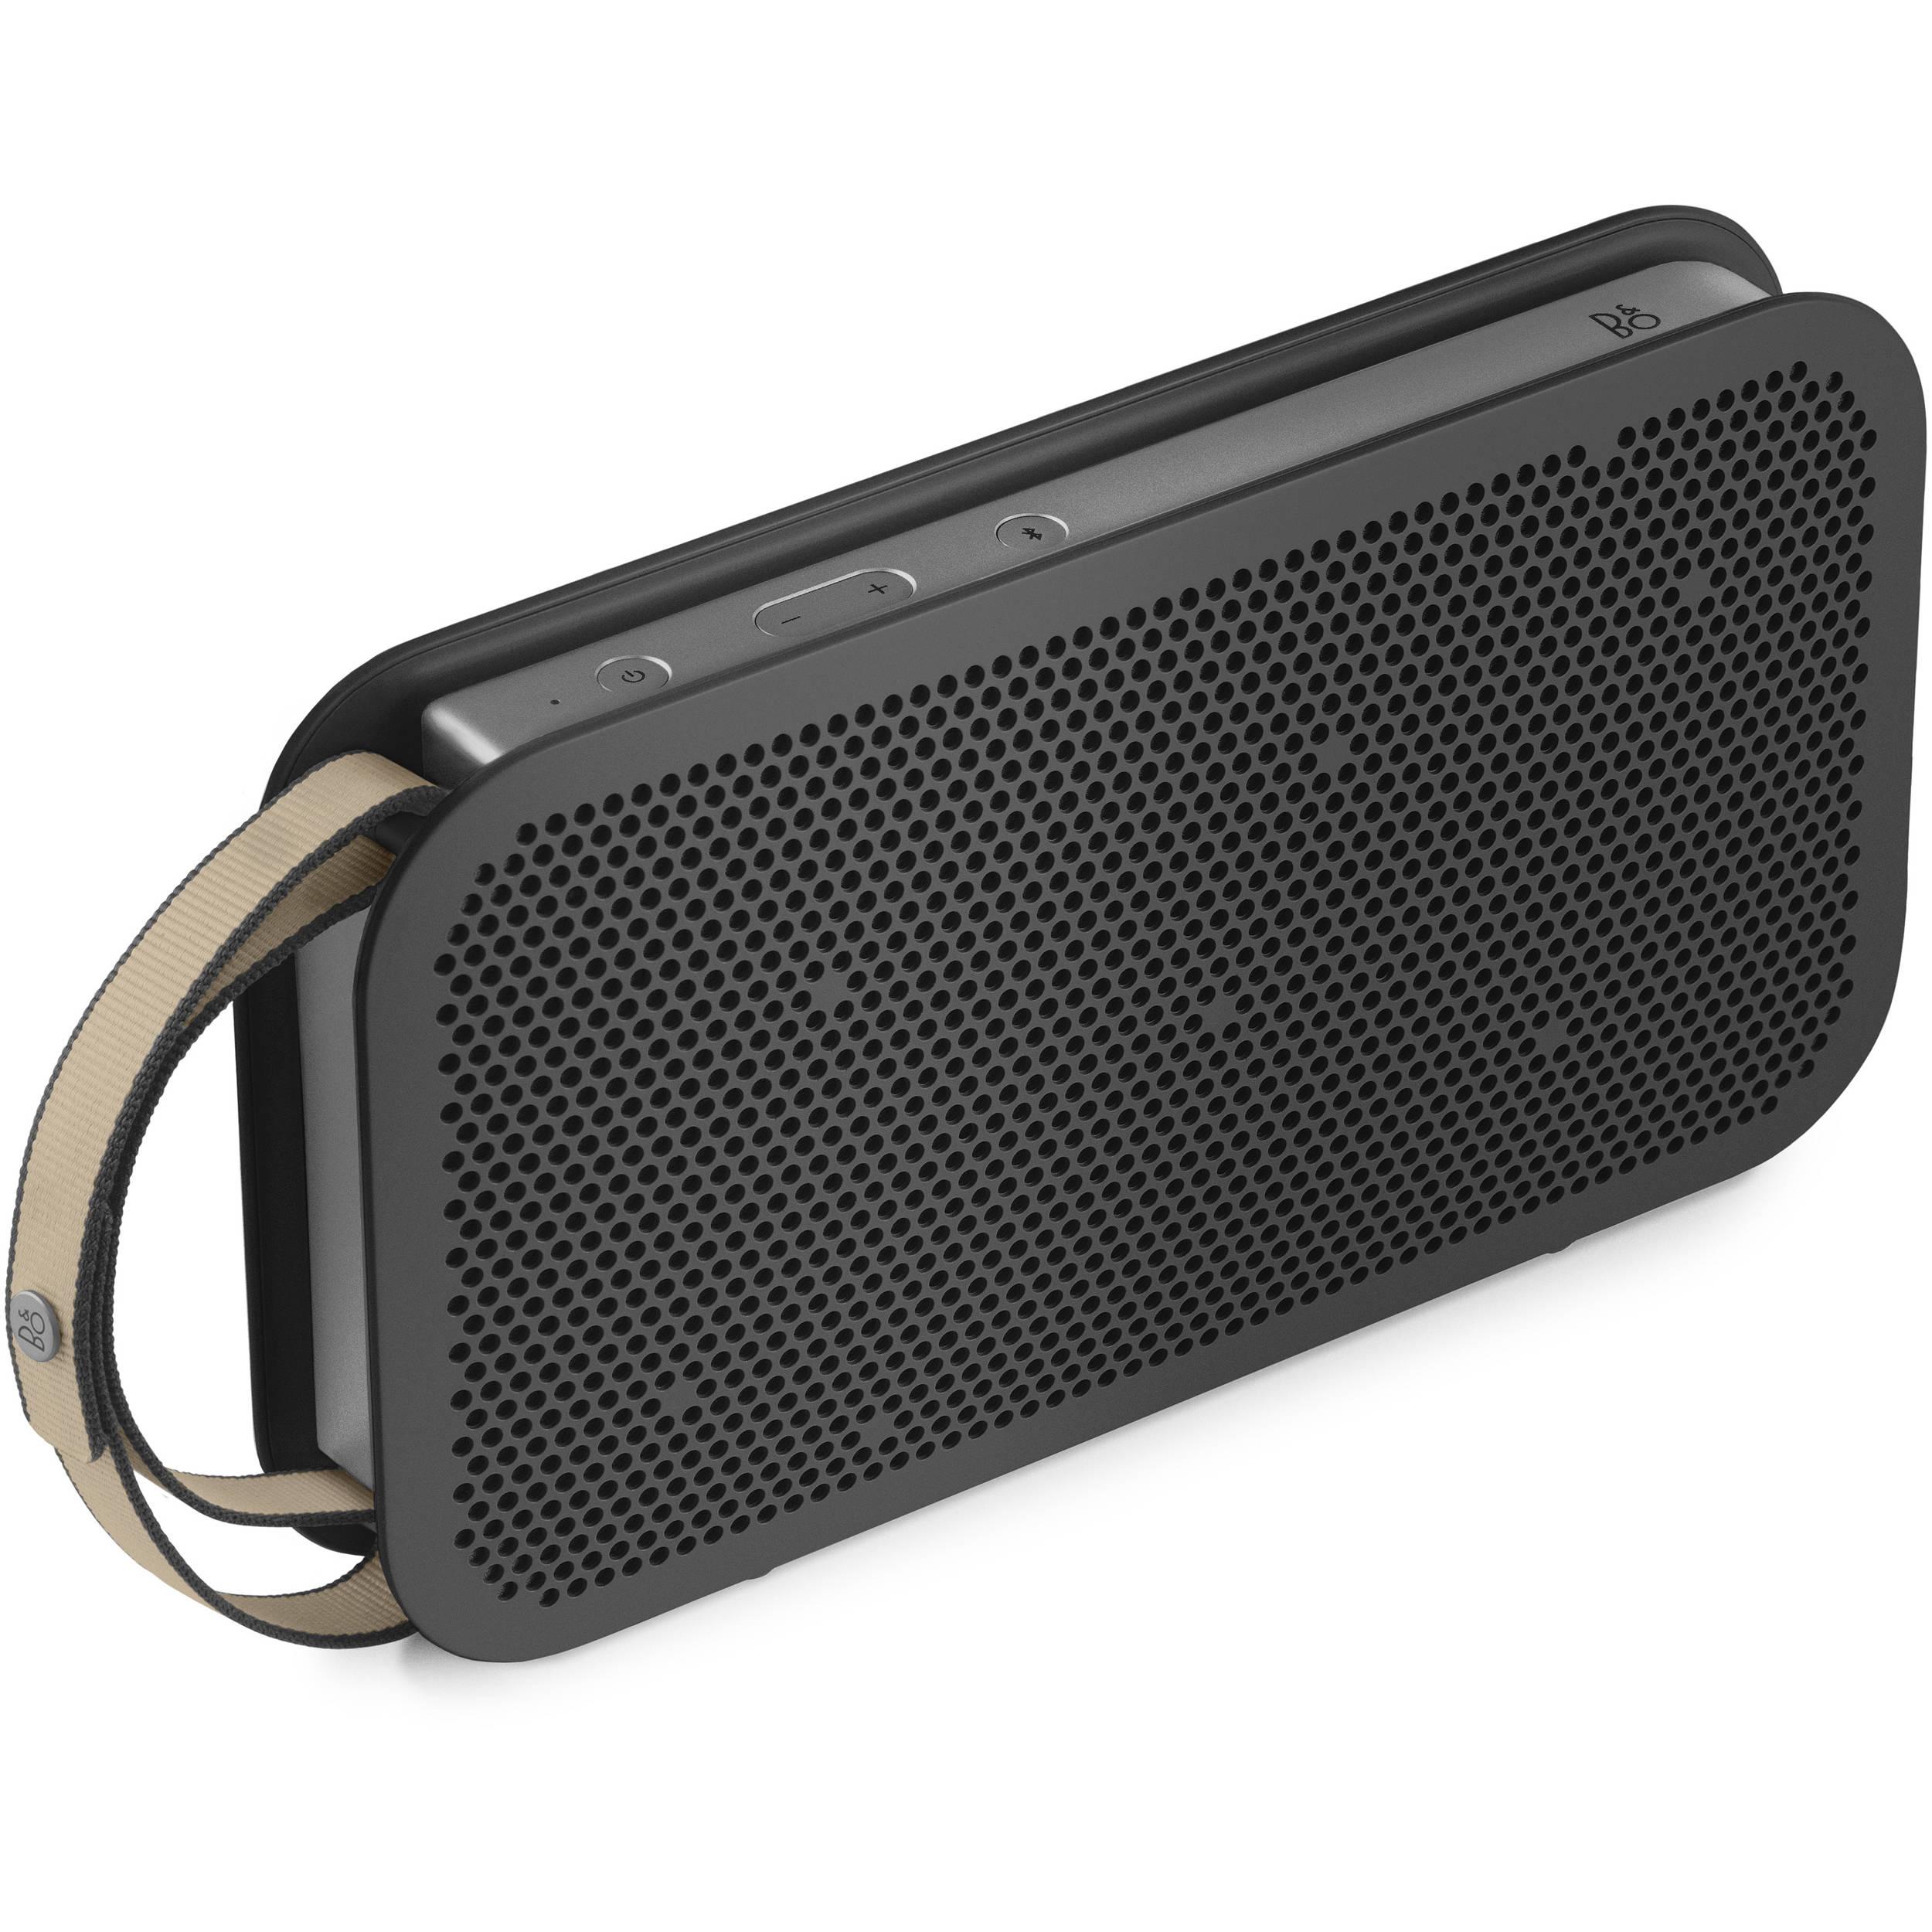 bang olufsen beoplay a2 active bluetooth speaker 1643773 b h. Black Bedroom Furniture Sets. Home Design Ideas